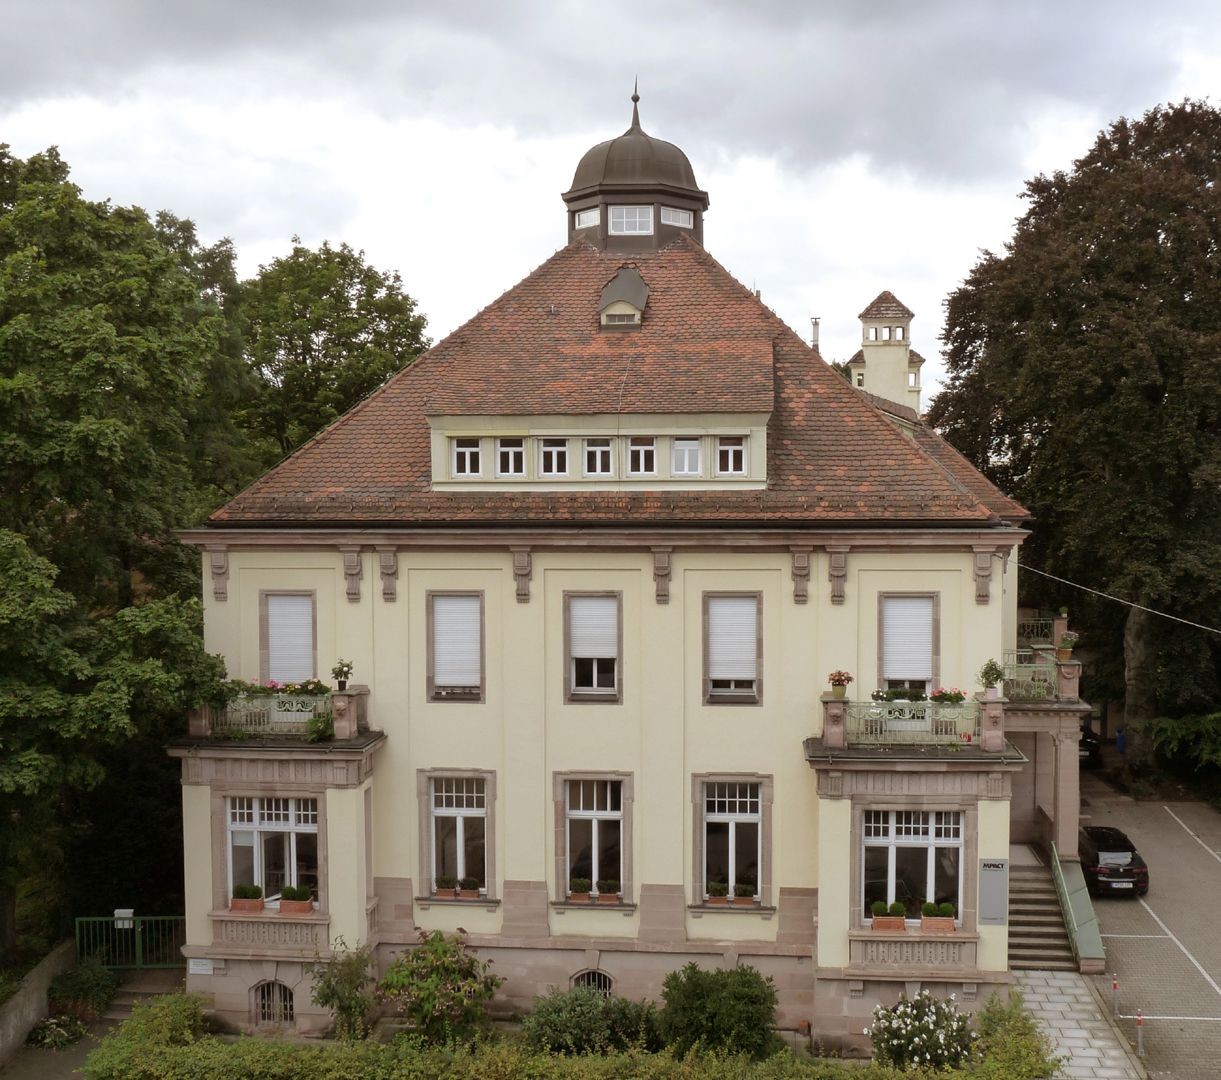 Residential Building, Campestraße 17 East, resp. main front